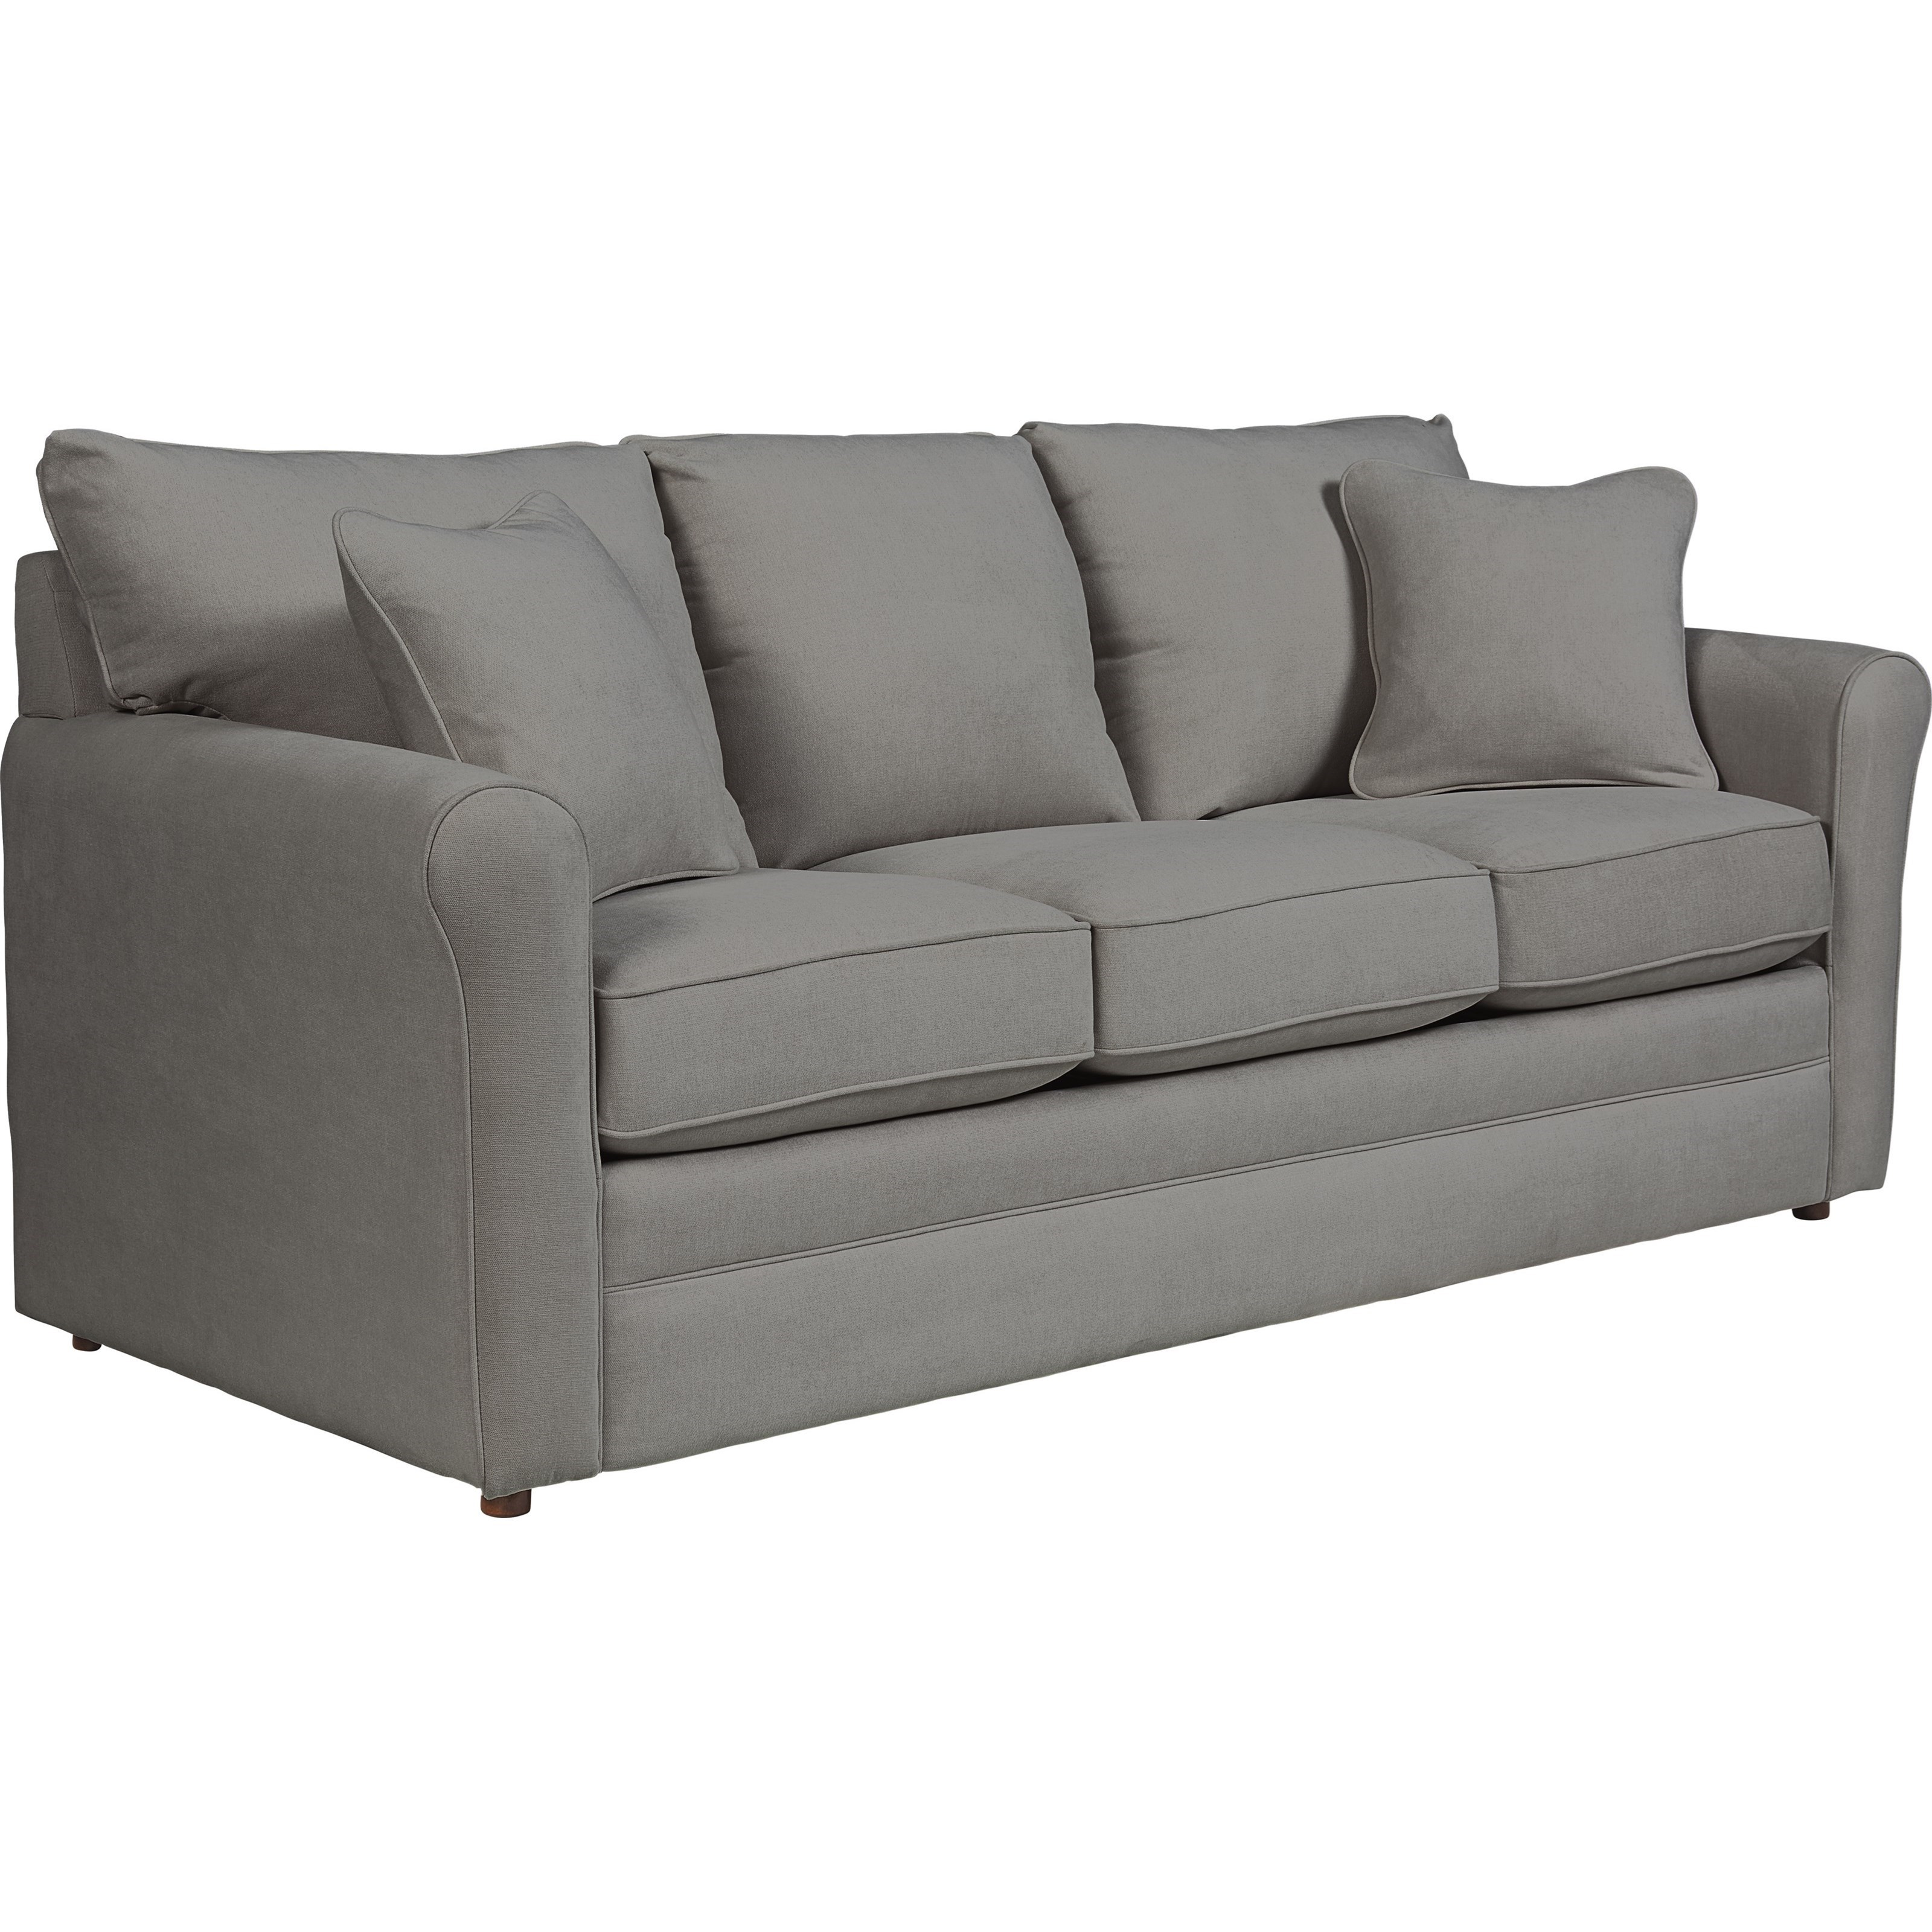 Picture of: La Z Boy Leah Supreme Comfort Queen Sleep Sofa Conlin S Furniture Sleeper Sofas